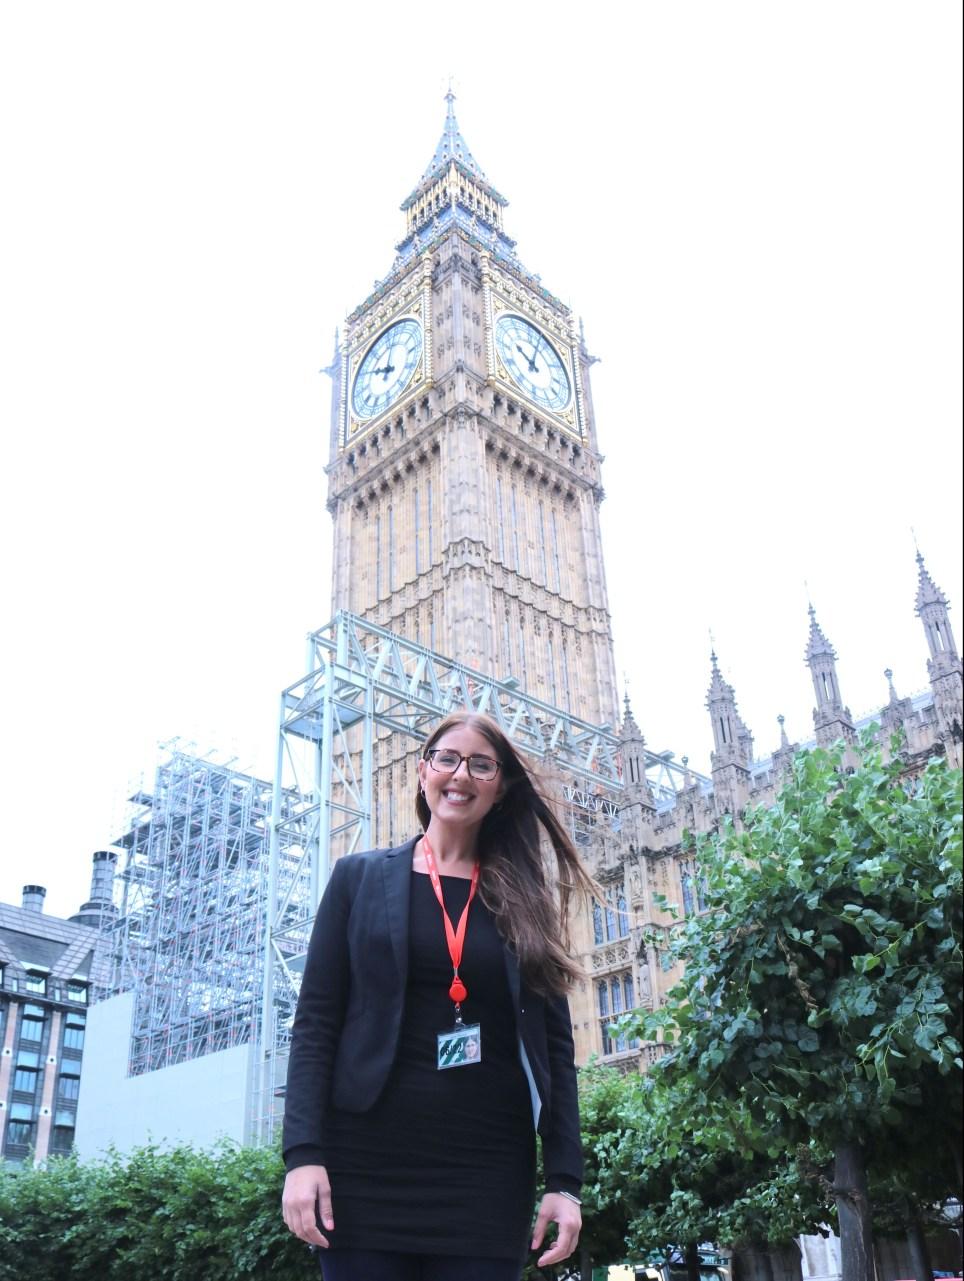 Laura Pidcock MP